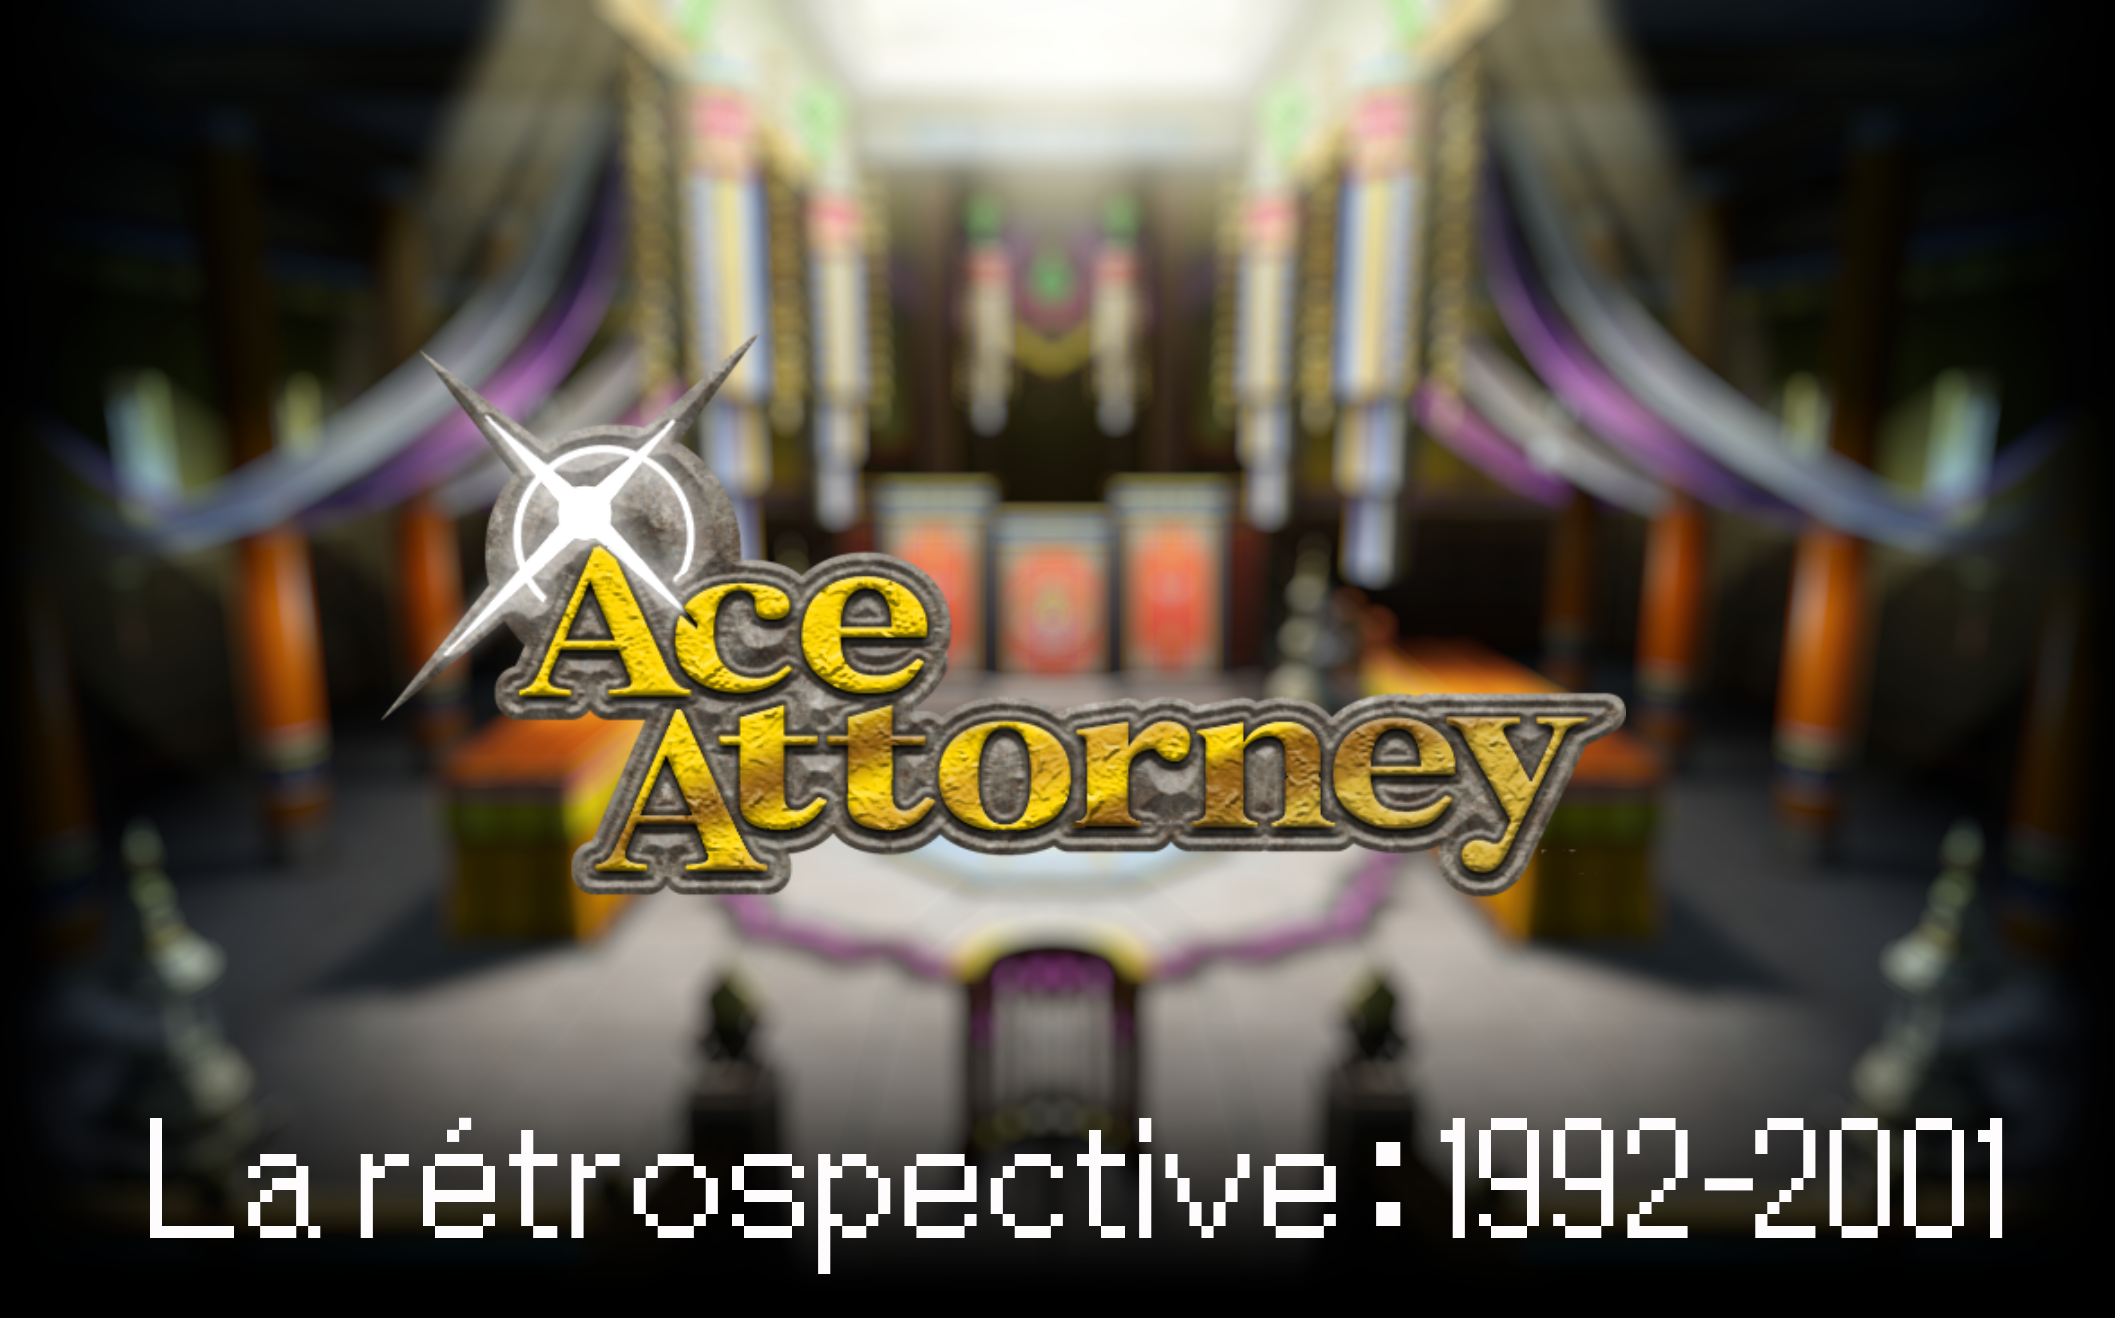 La rétrospective Ace Attorney commence aujourd'hui.